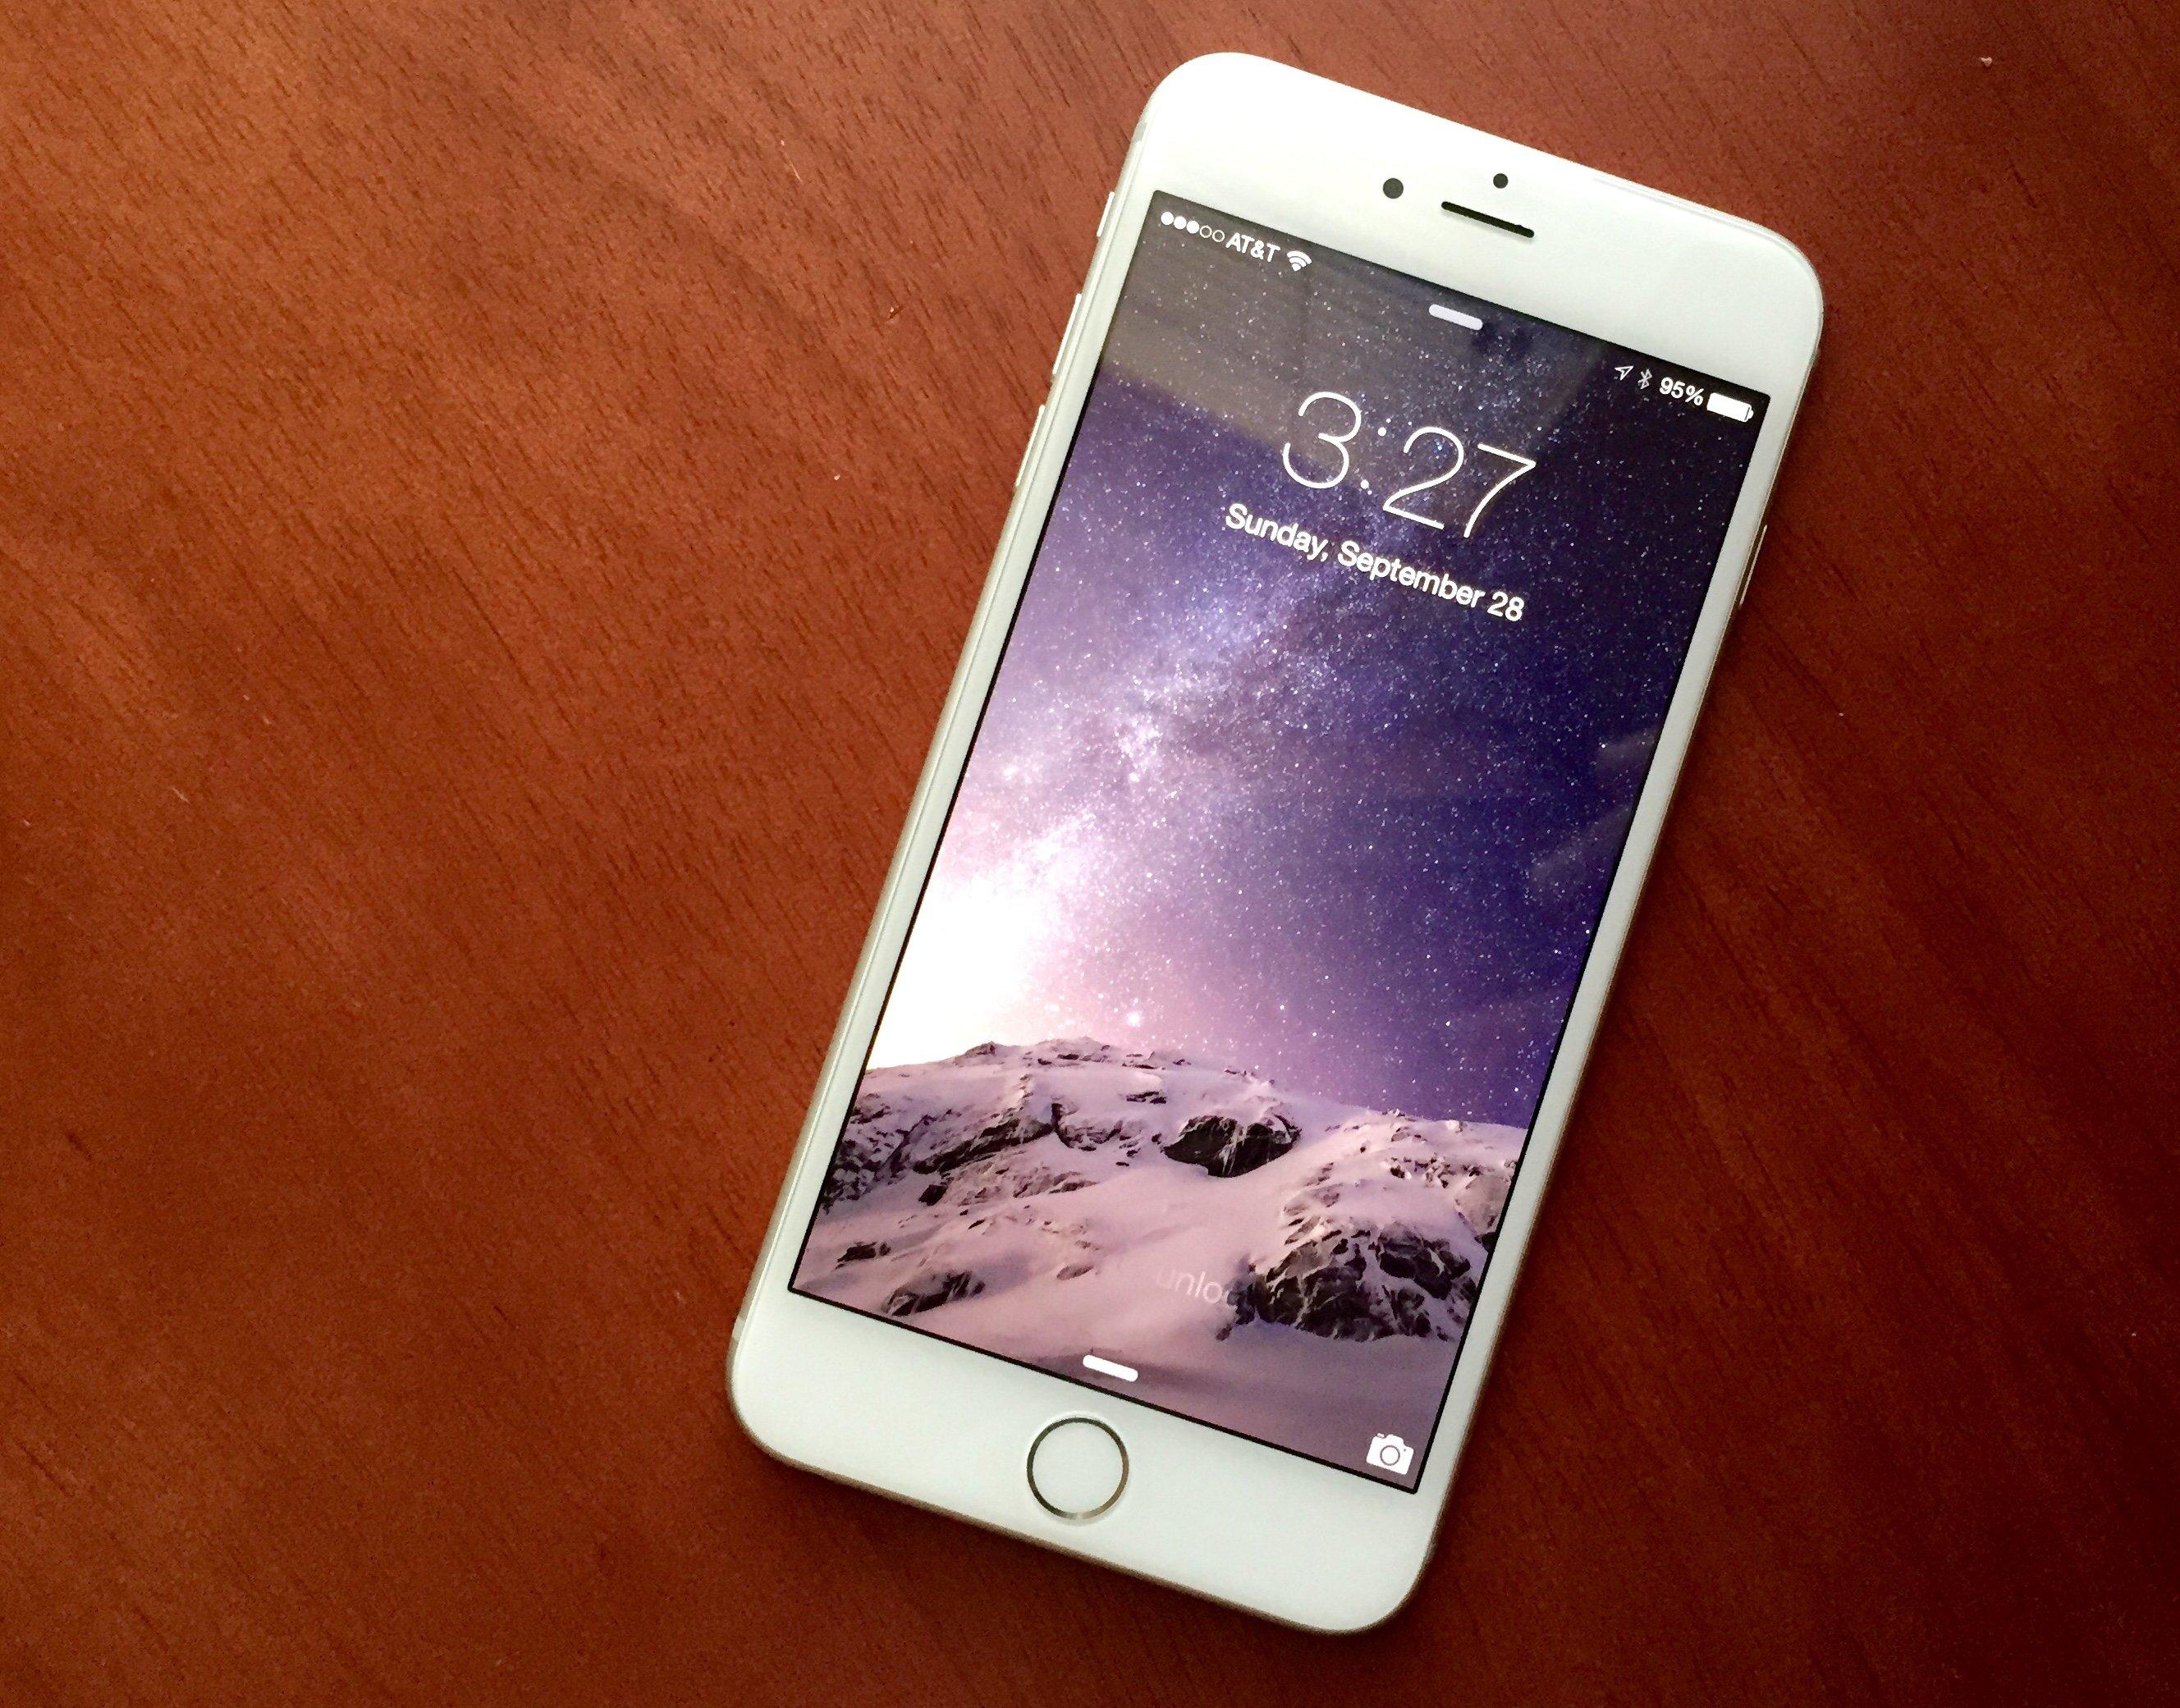 Renoverade iPhone 6-erbjudanden ger stora besparingar.